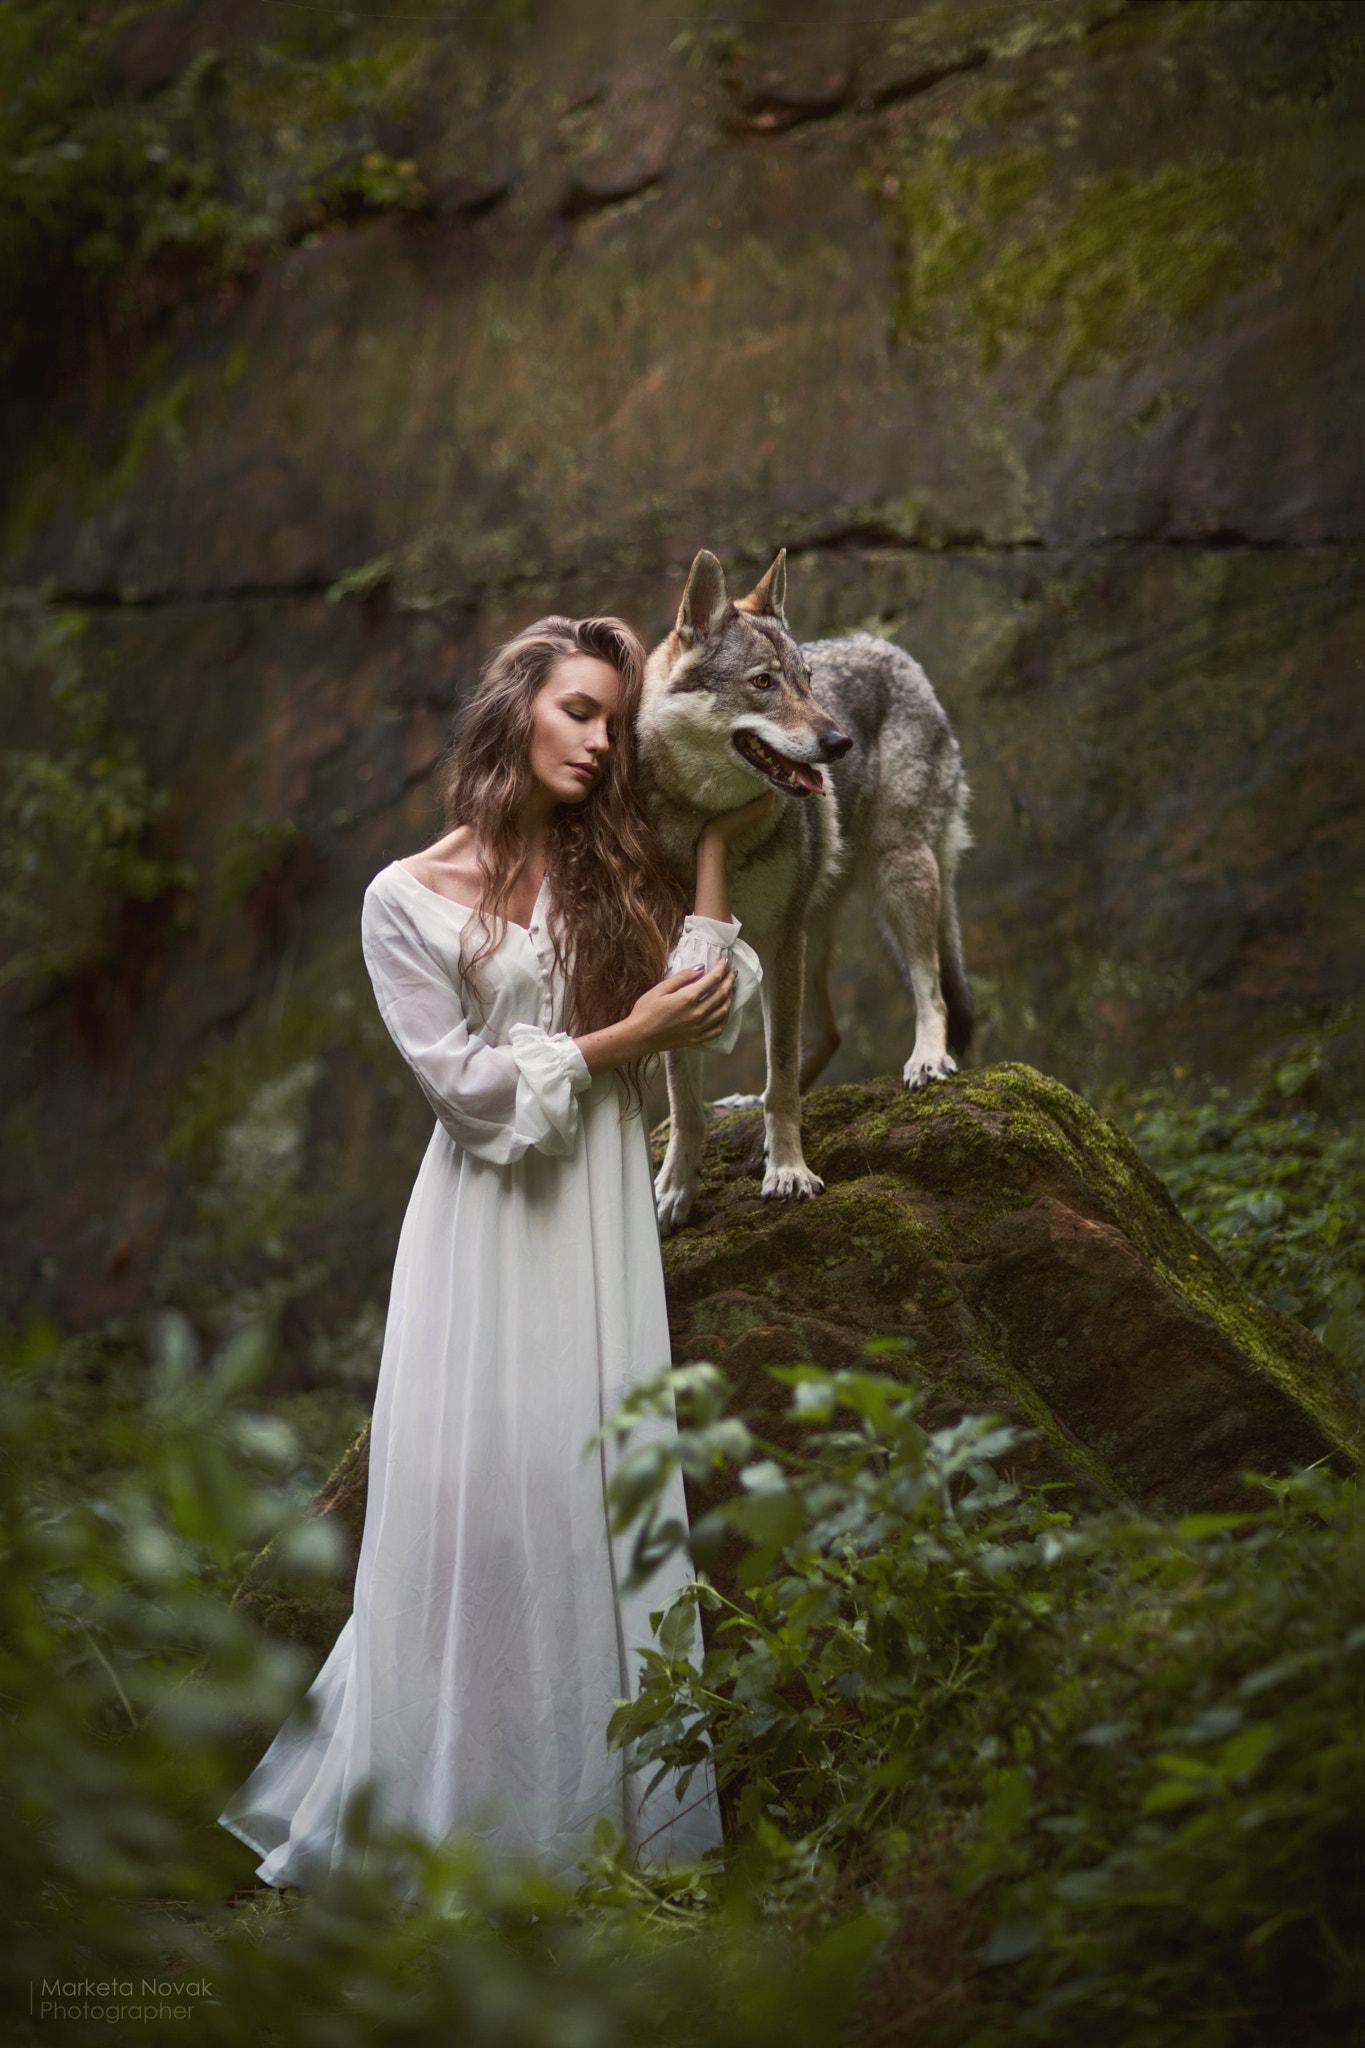 women Outdoors, Women, Model, Fantasy Art, Collage